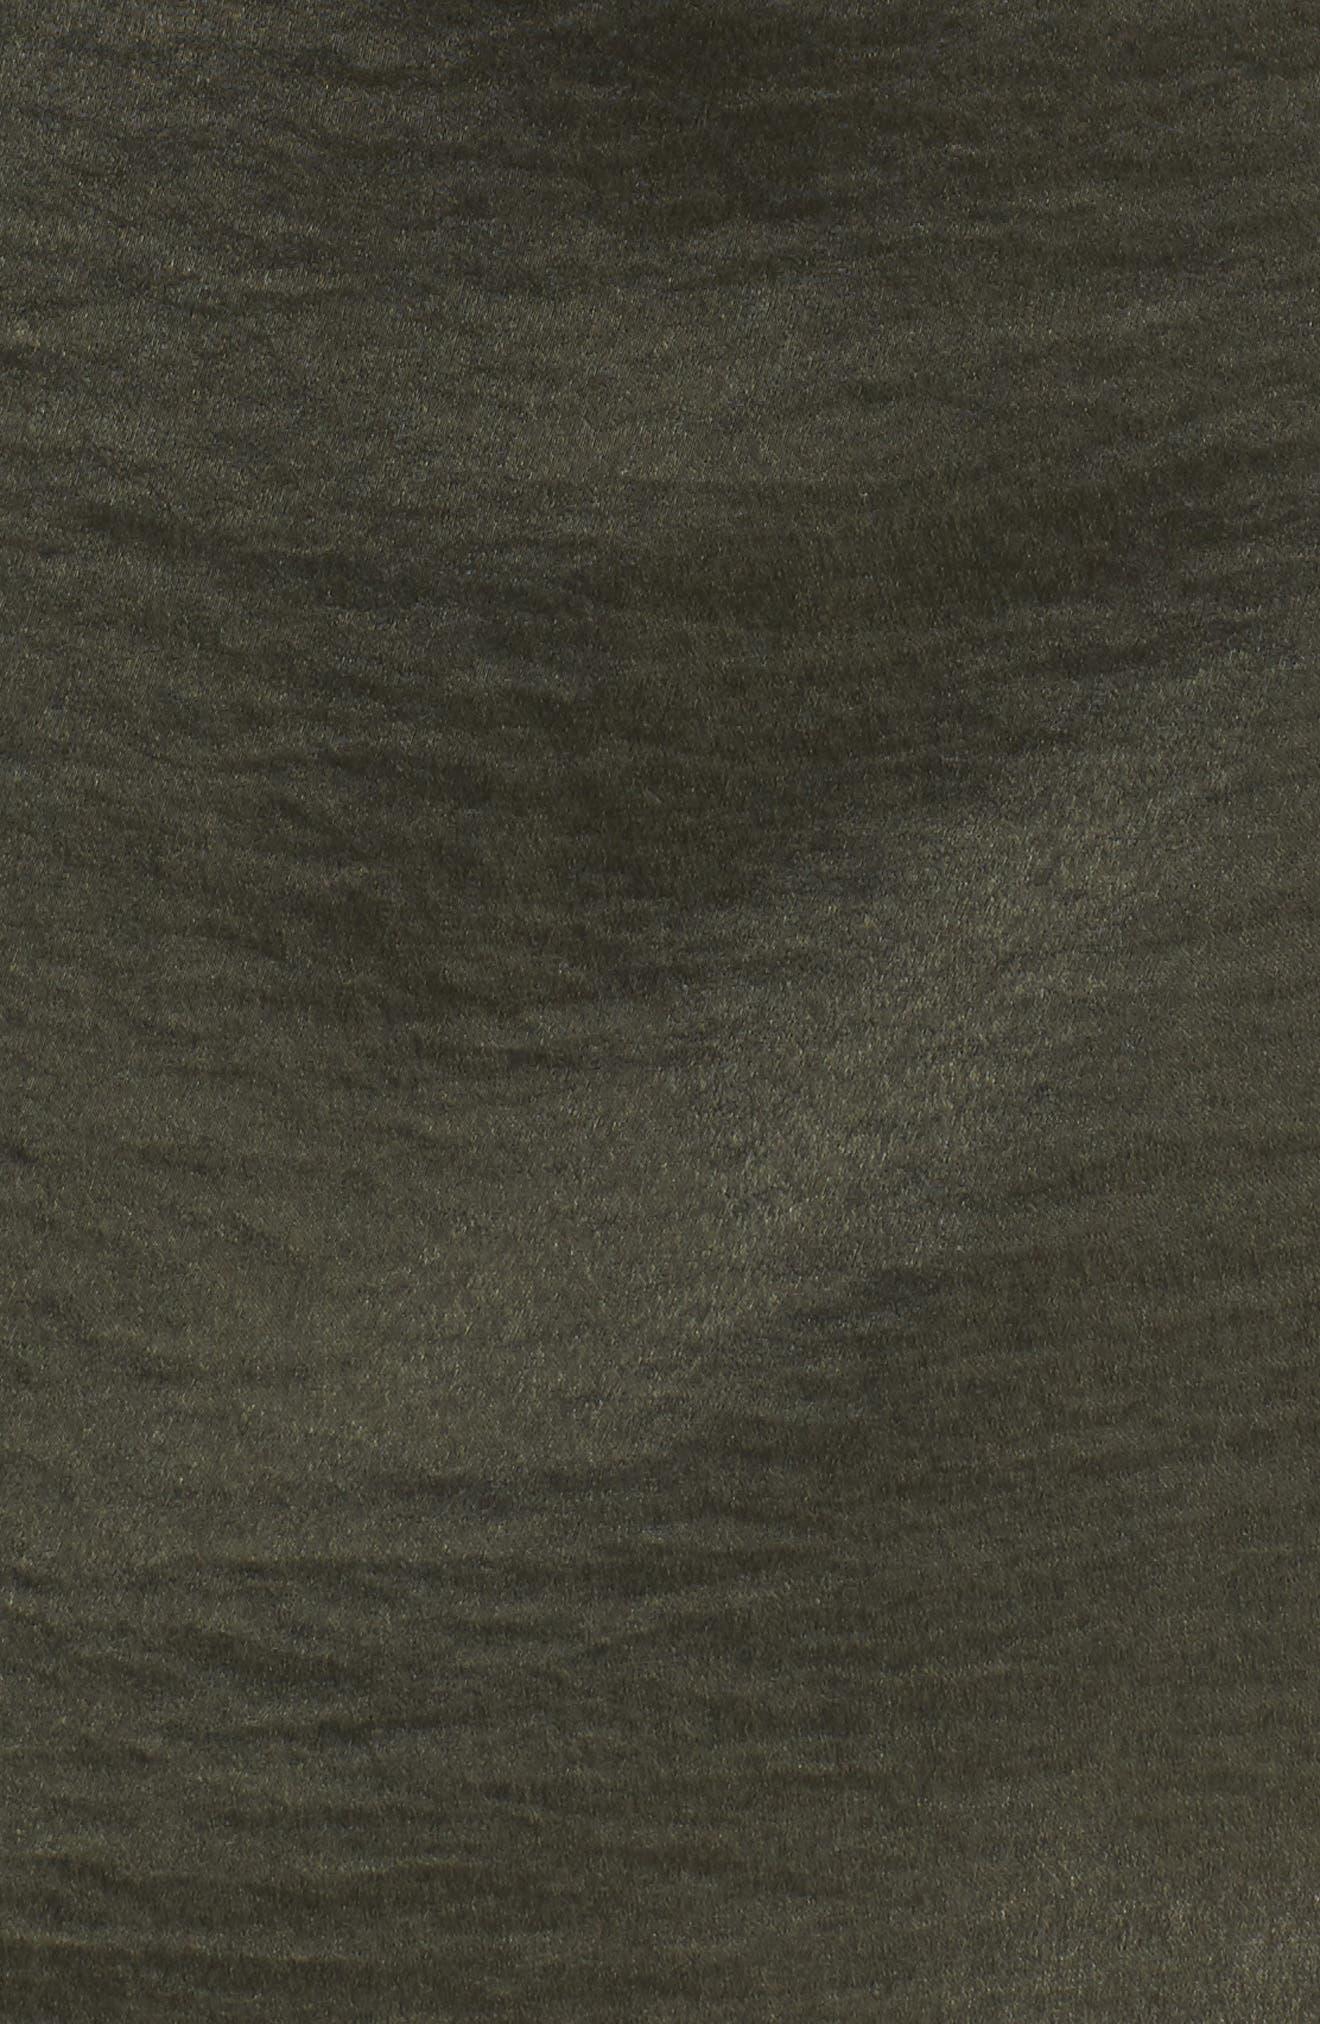 Hansel Sleeveless Dress,                             Alternate thumbnail 6, color,                             Army